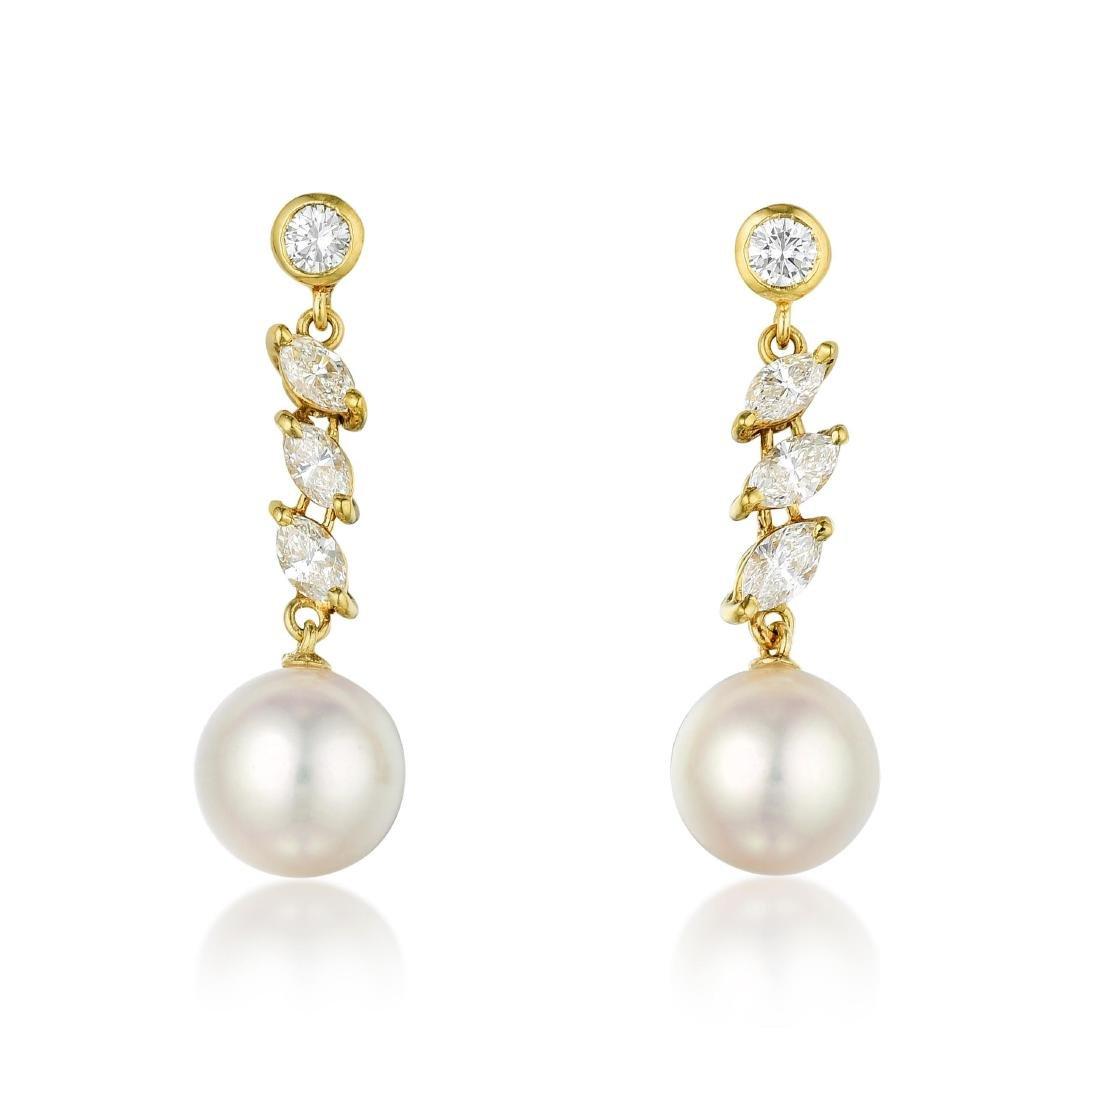 Mikimoto Cultured Pearl and Diamond Drop Earrings